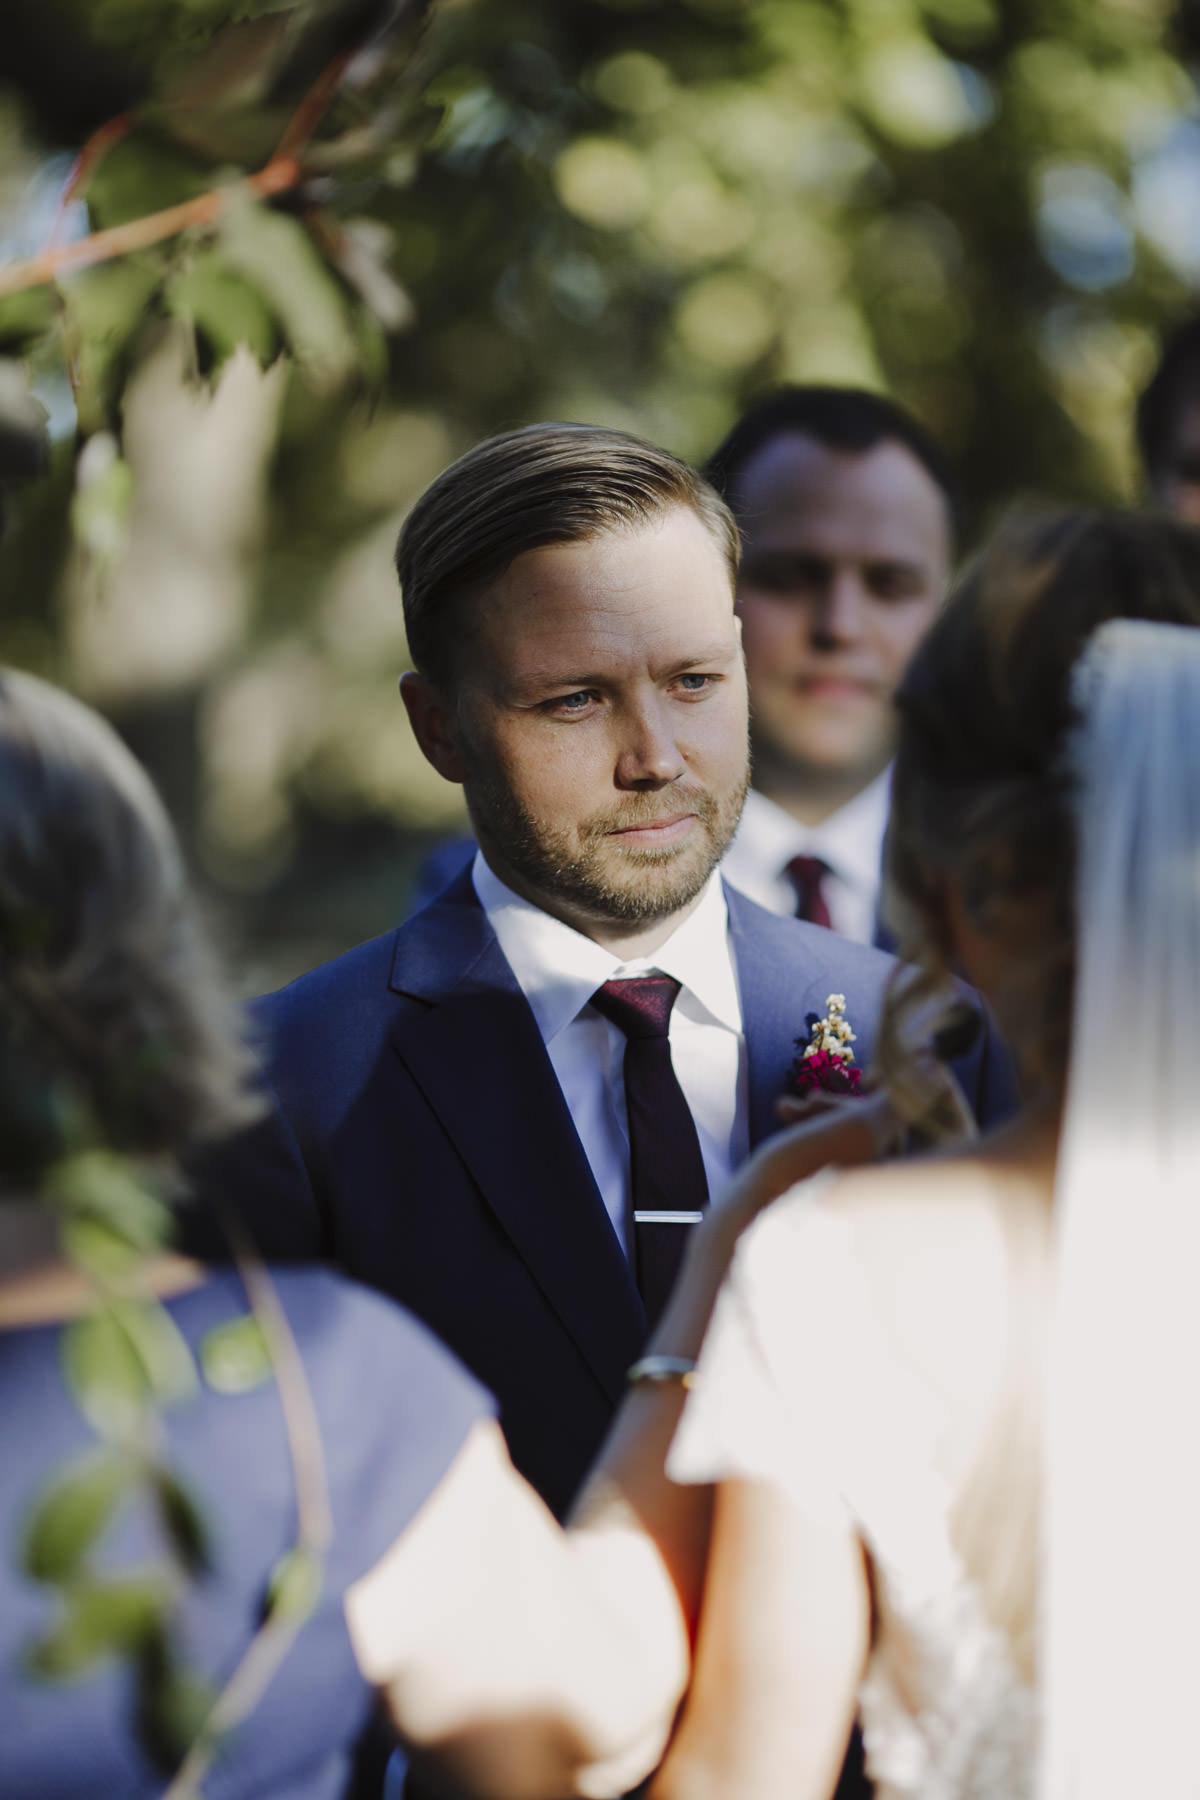 160506_justinaaron_wedding_holly_daniel_pr-104.jpg